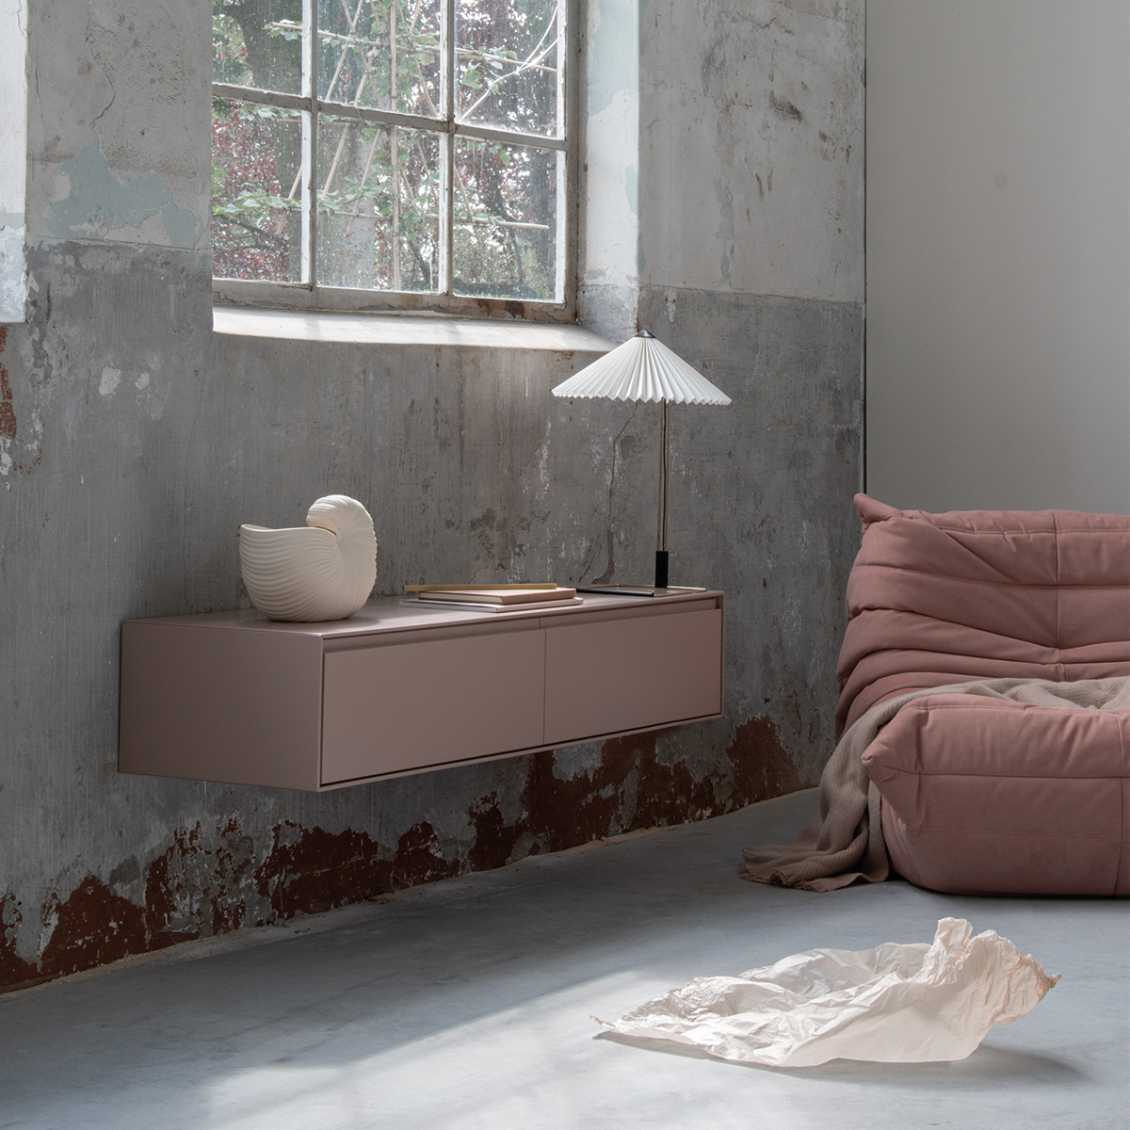 Roze interieuritems: 5 tips!